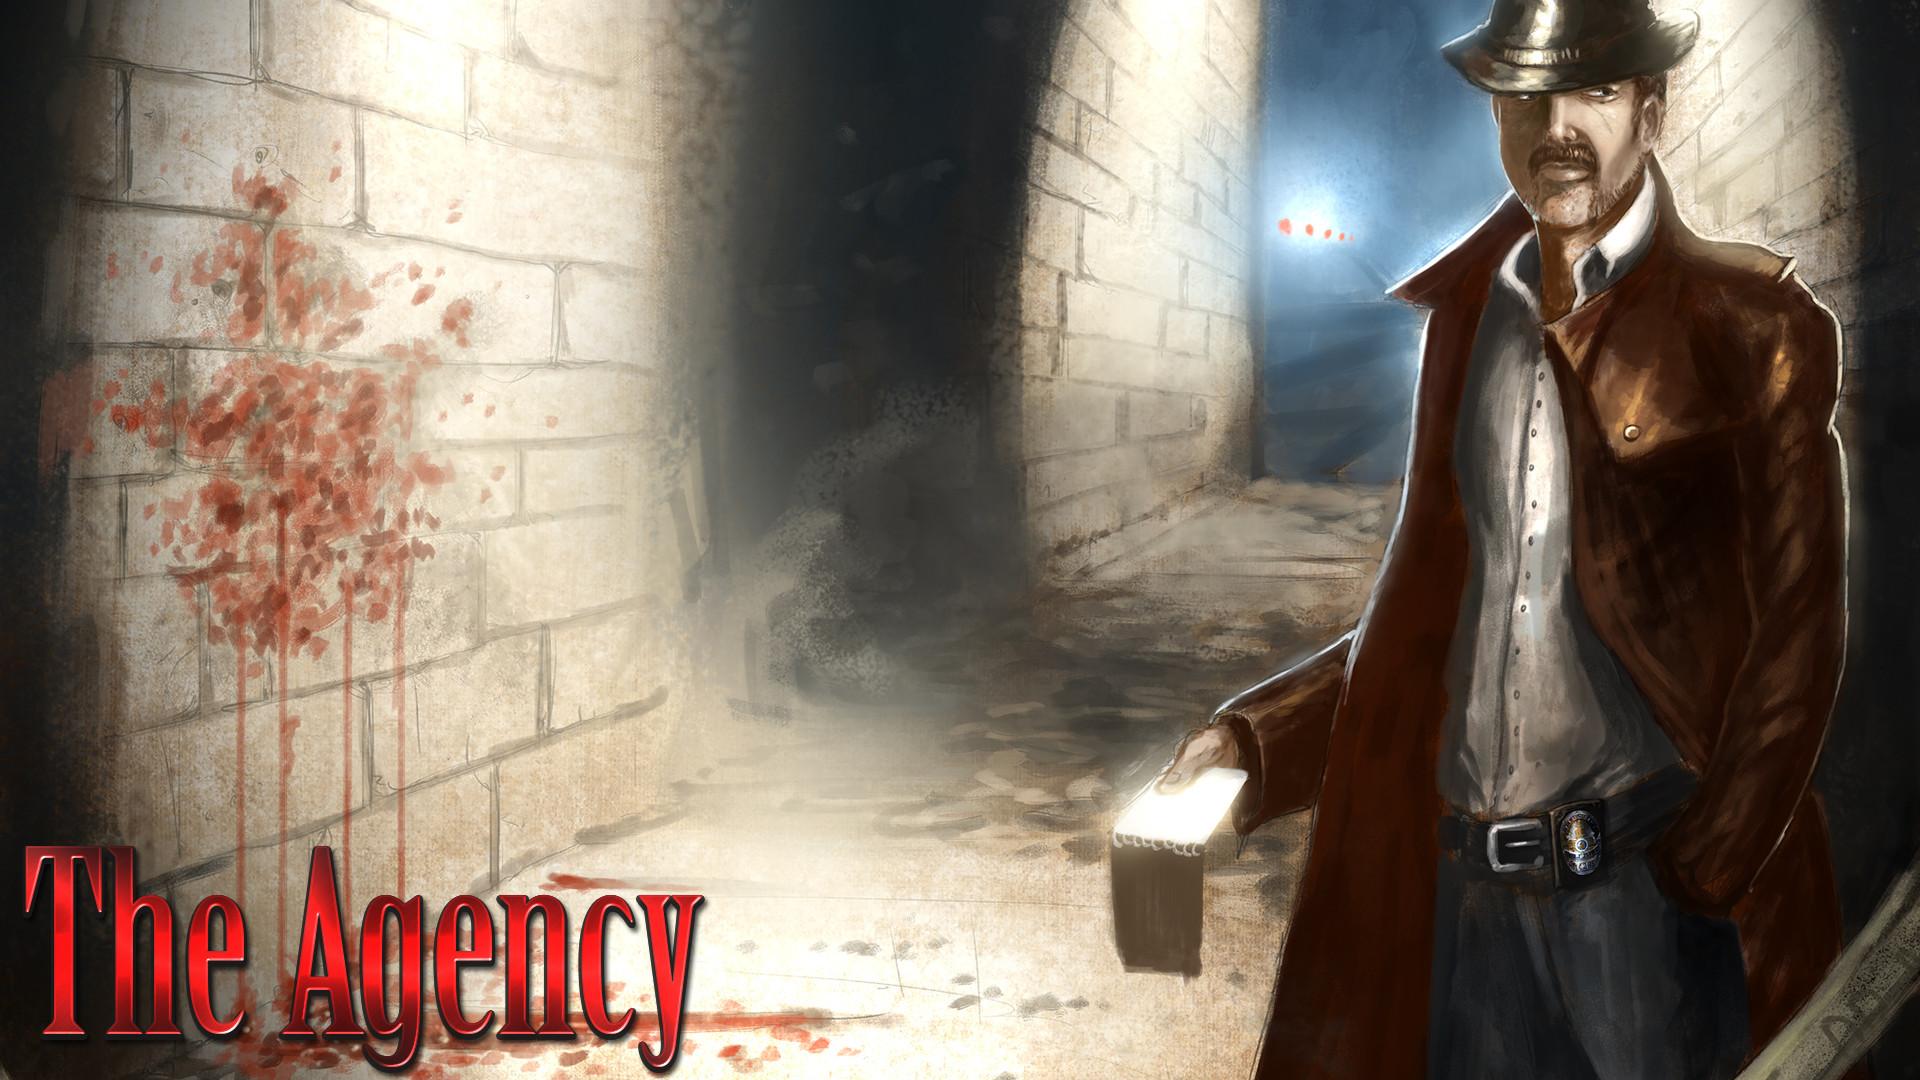 RPG Maker VX Ace - The Agency screenshot